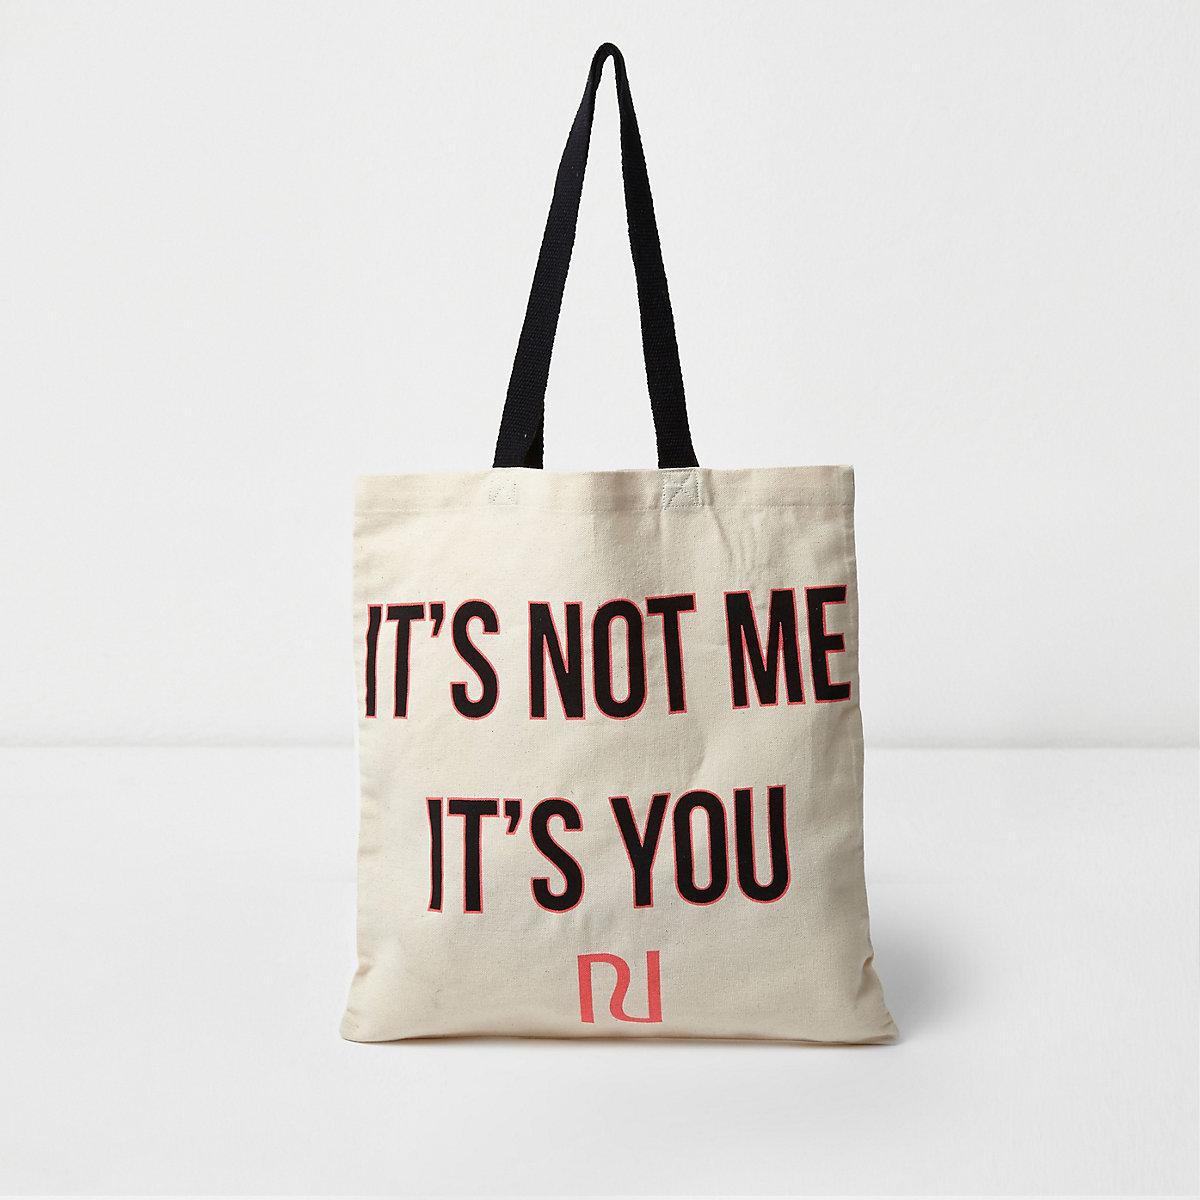 Beige 'it's not me it's you' shopper tote bag